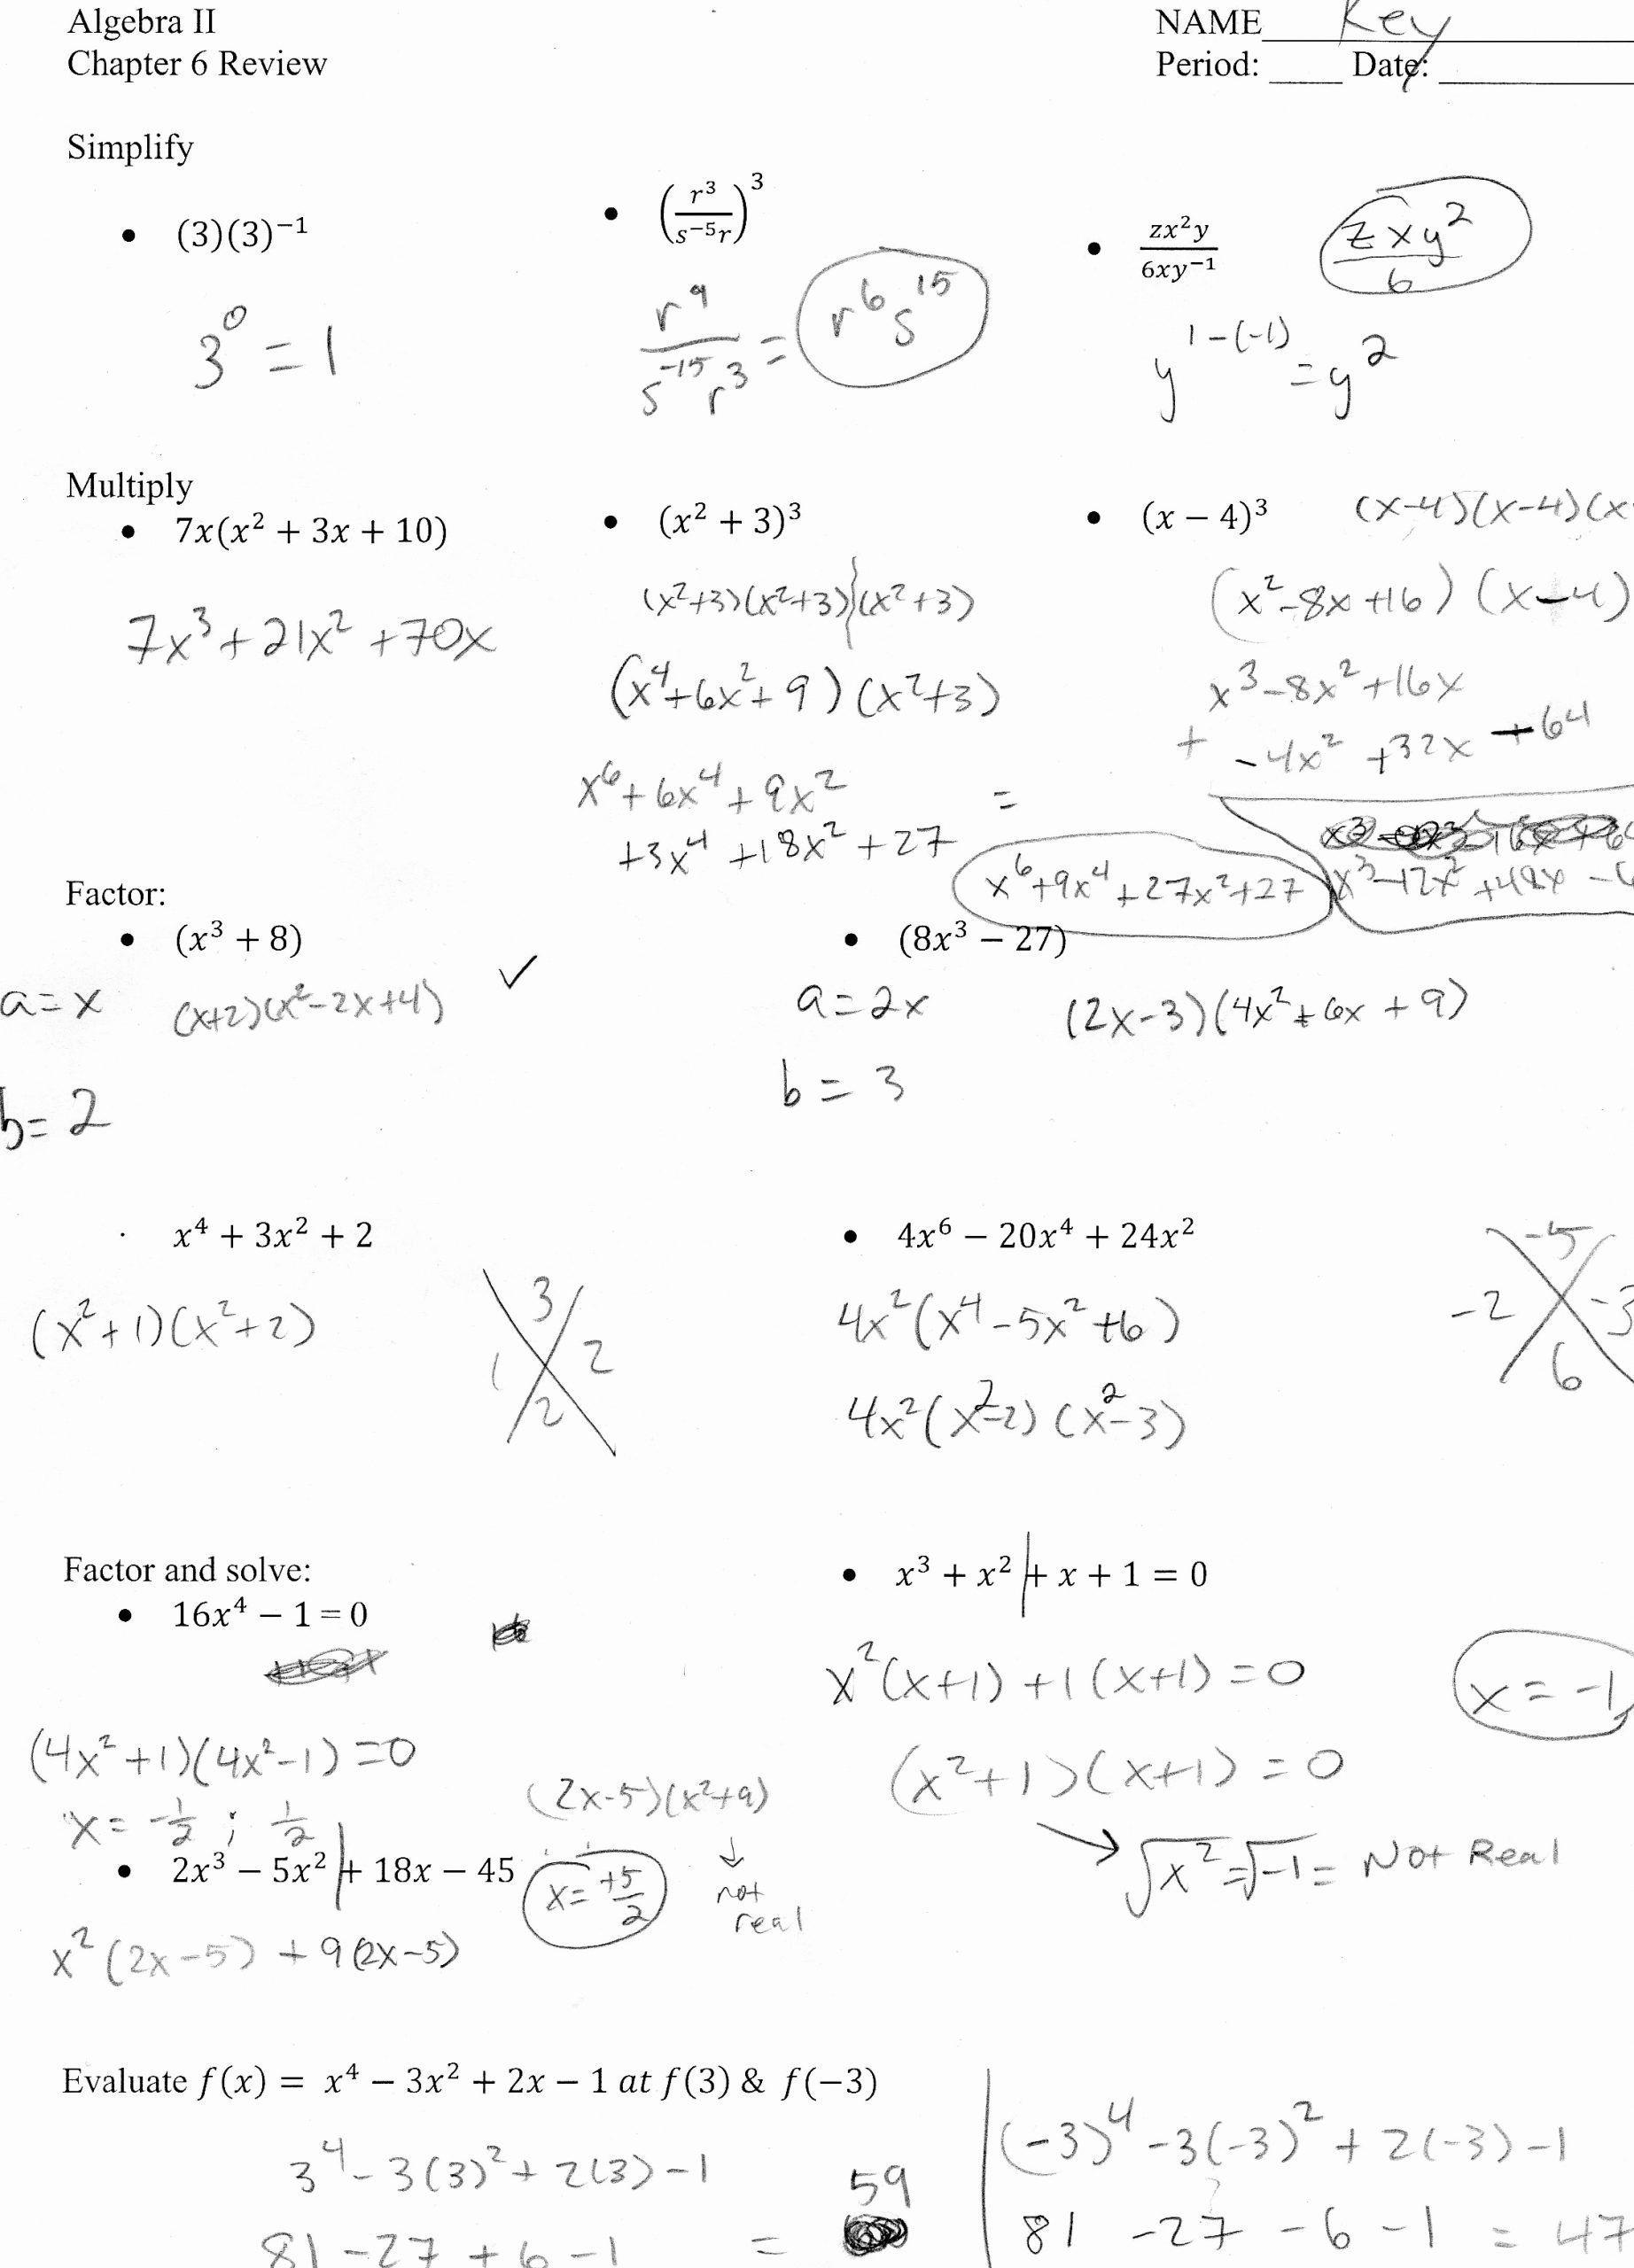 Algebra 2 Worksheet Fresh Algebra Ii Mr Shepherd S